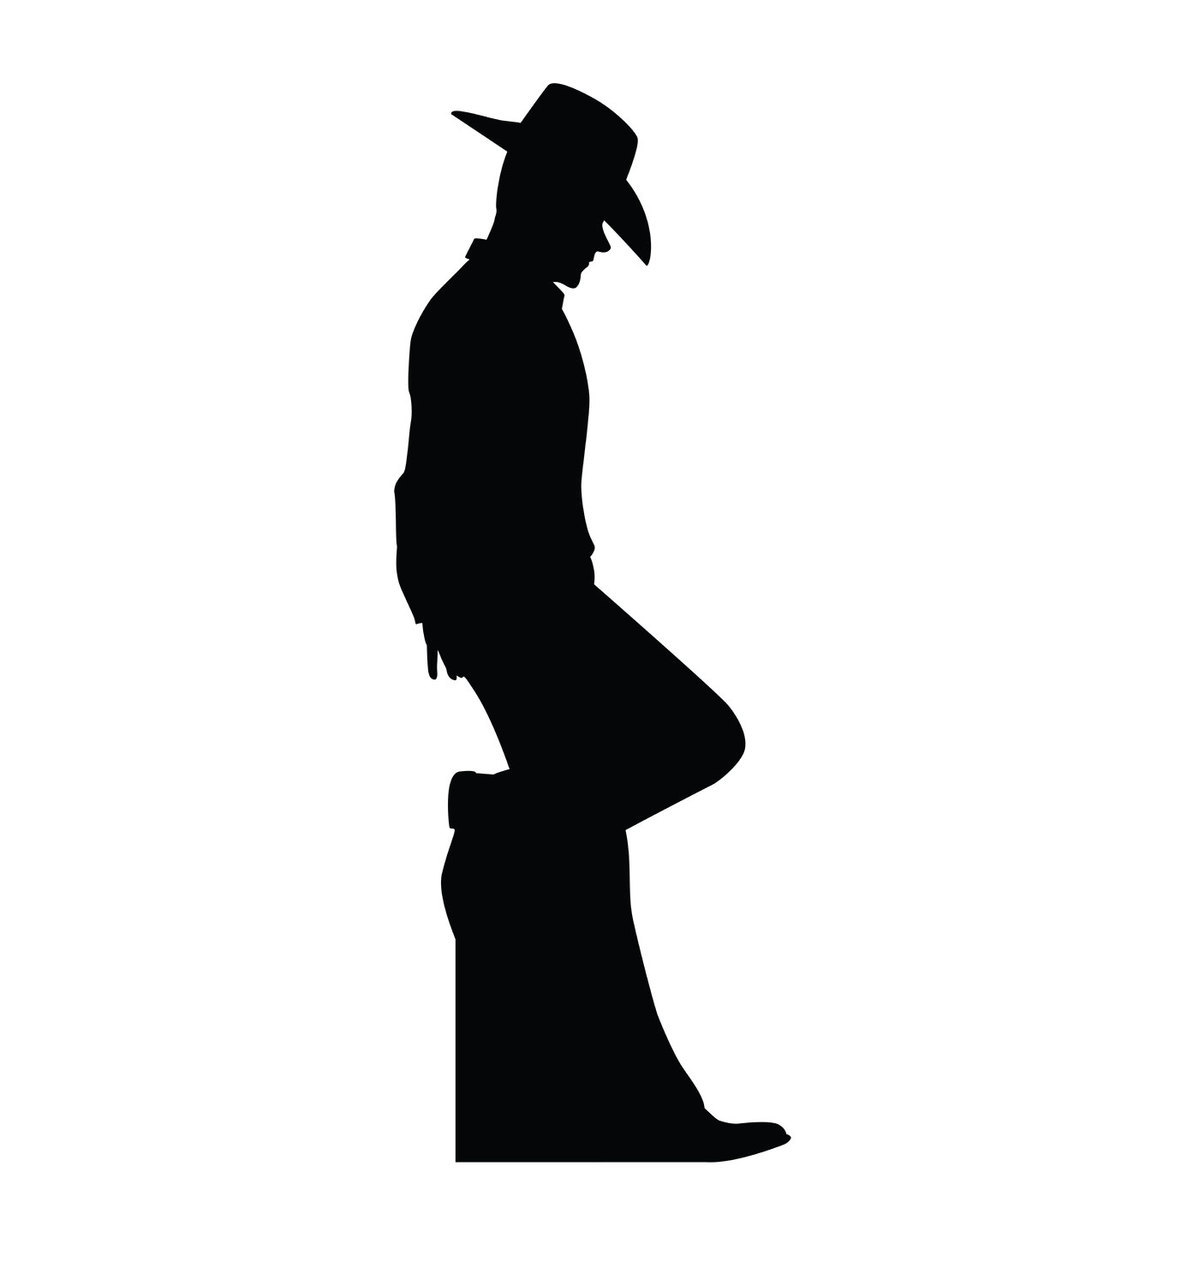 hight resolution of 1199x1280 su 2317 cowboy silhouette cardboard cutout standup